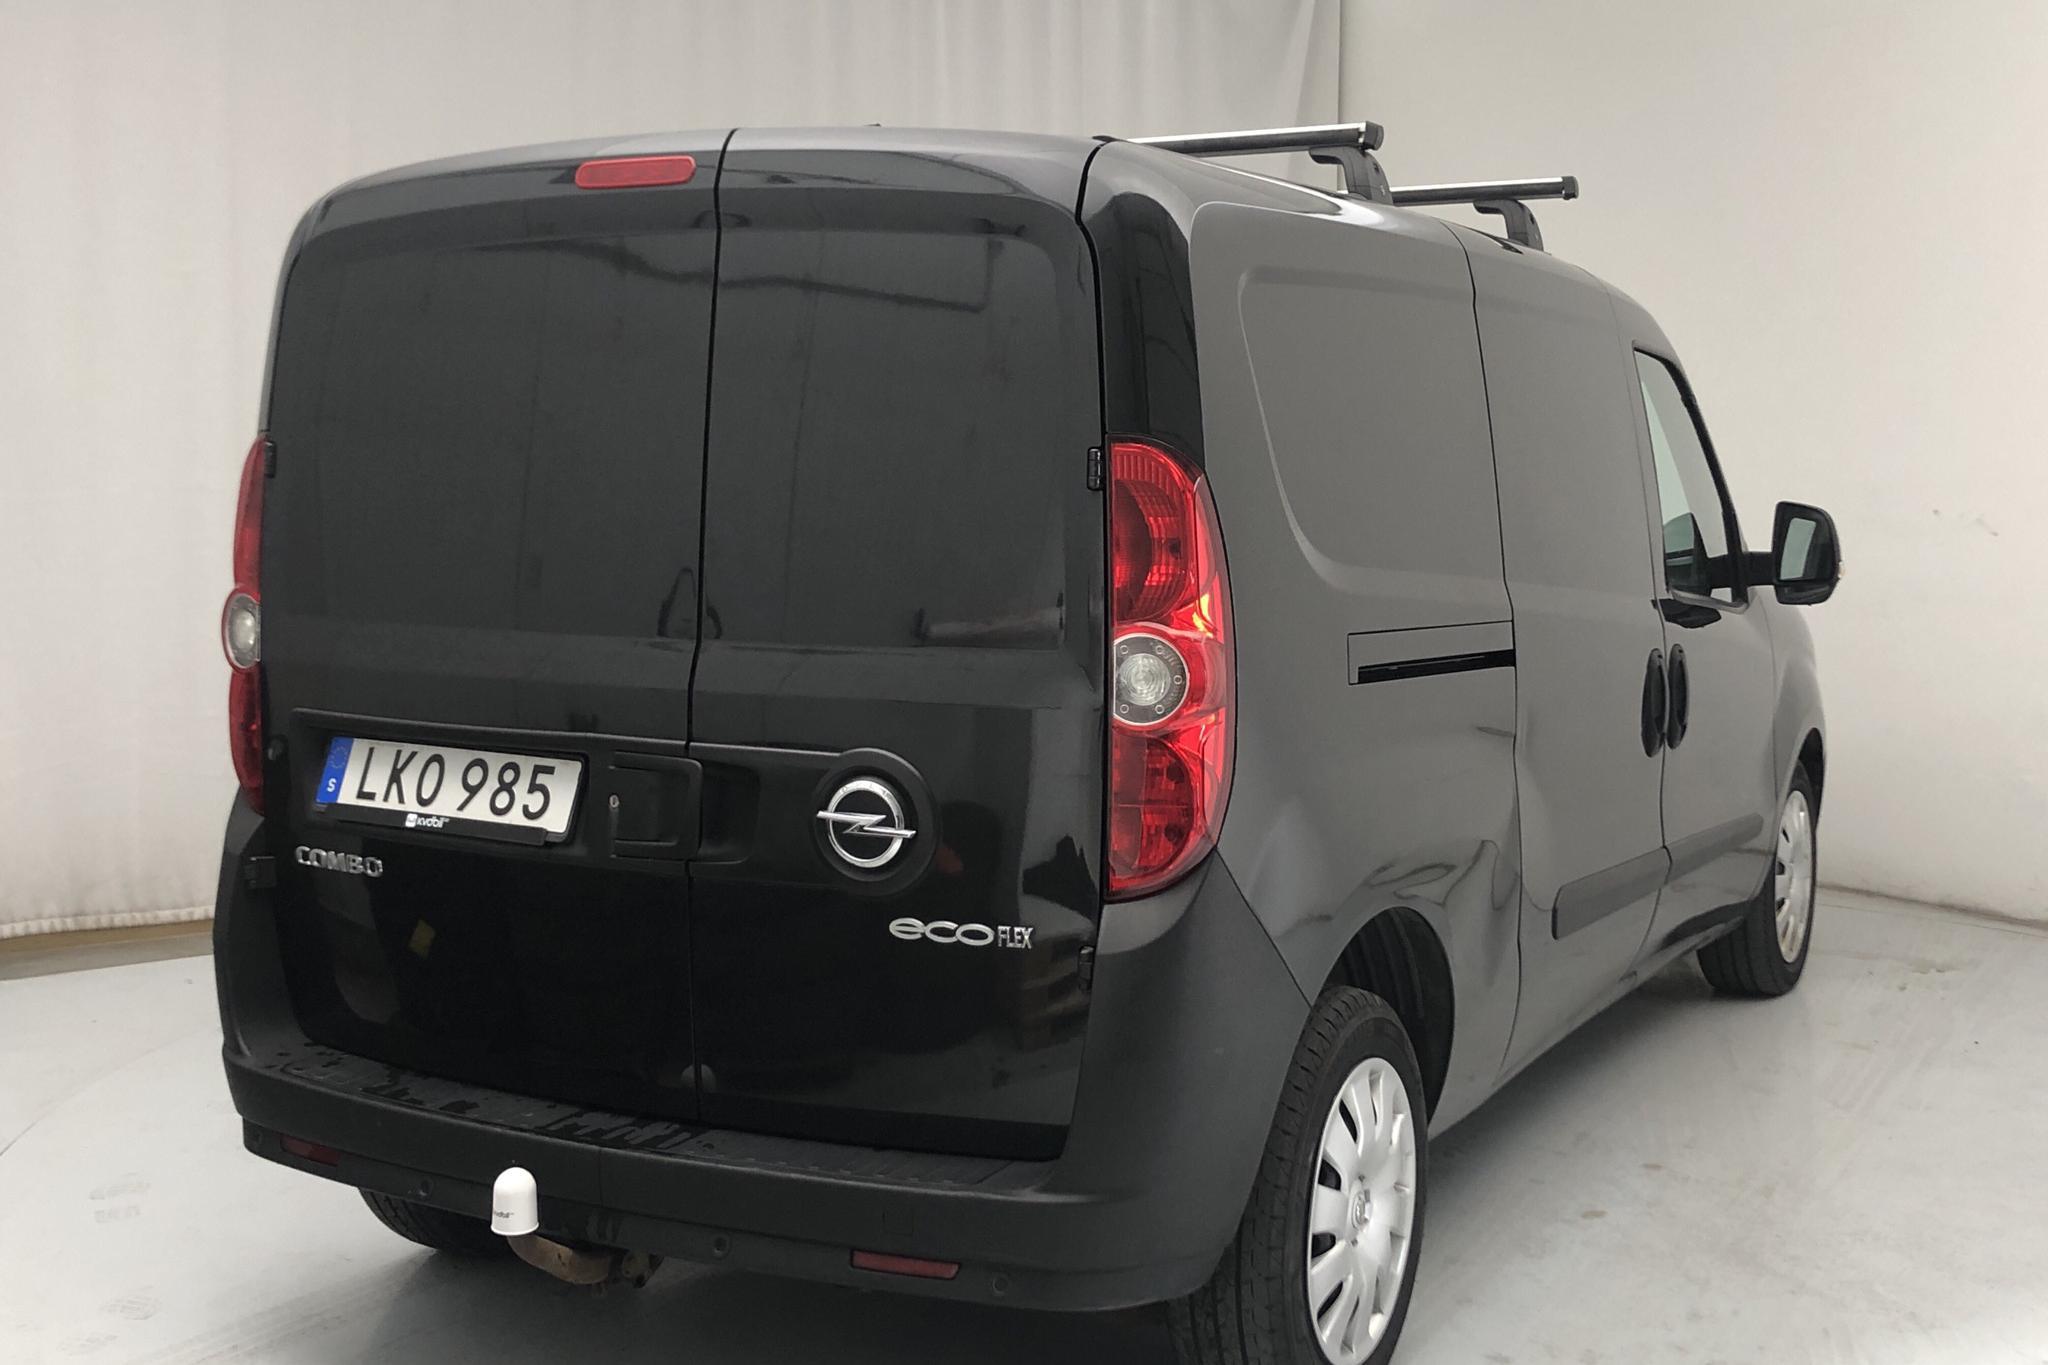 Opel Combo 1.3 CDTI Skåp (90hk) - 126 530 km - Manual - black - 2014